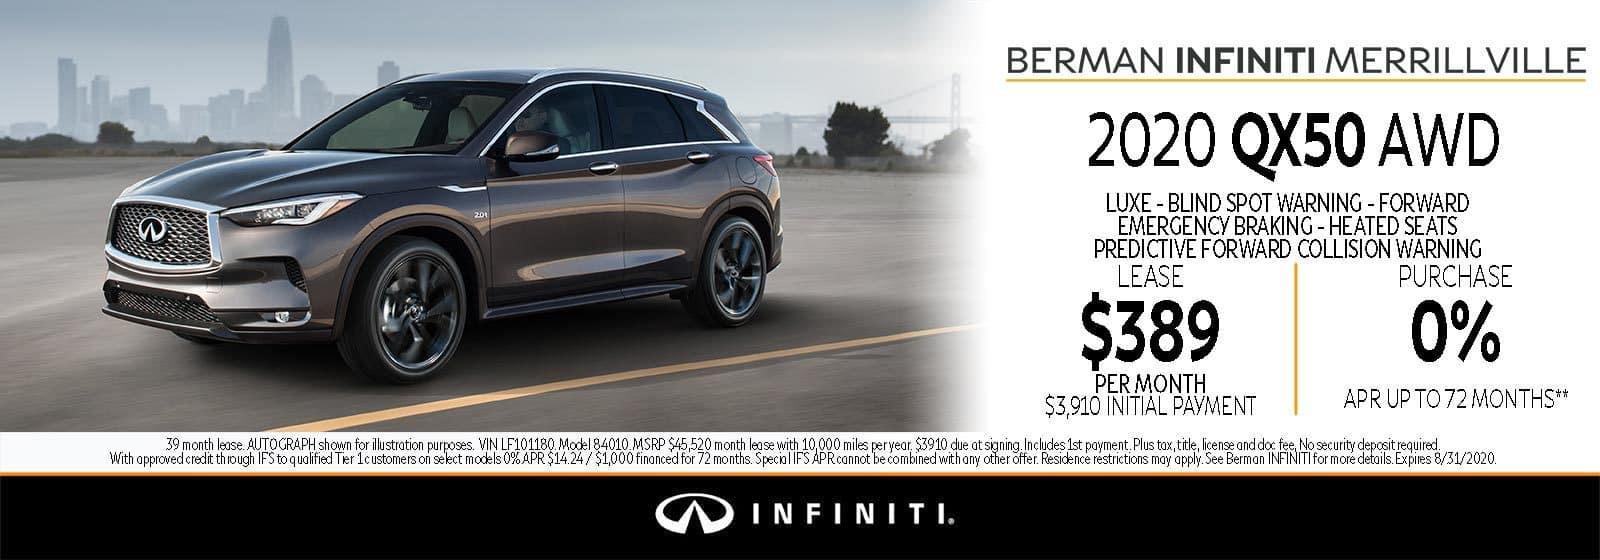 New 2020 INFINITI QX50 August Offer at Berman INFINITI of Merrillville!